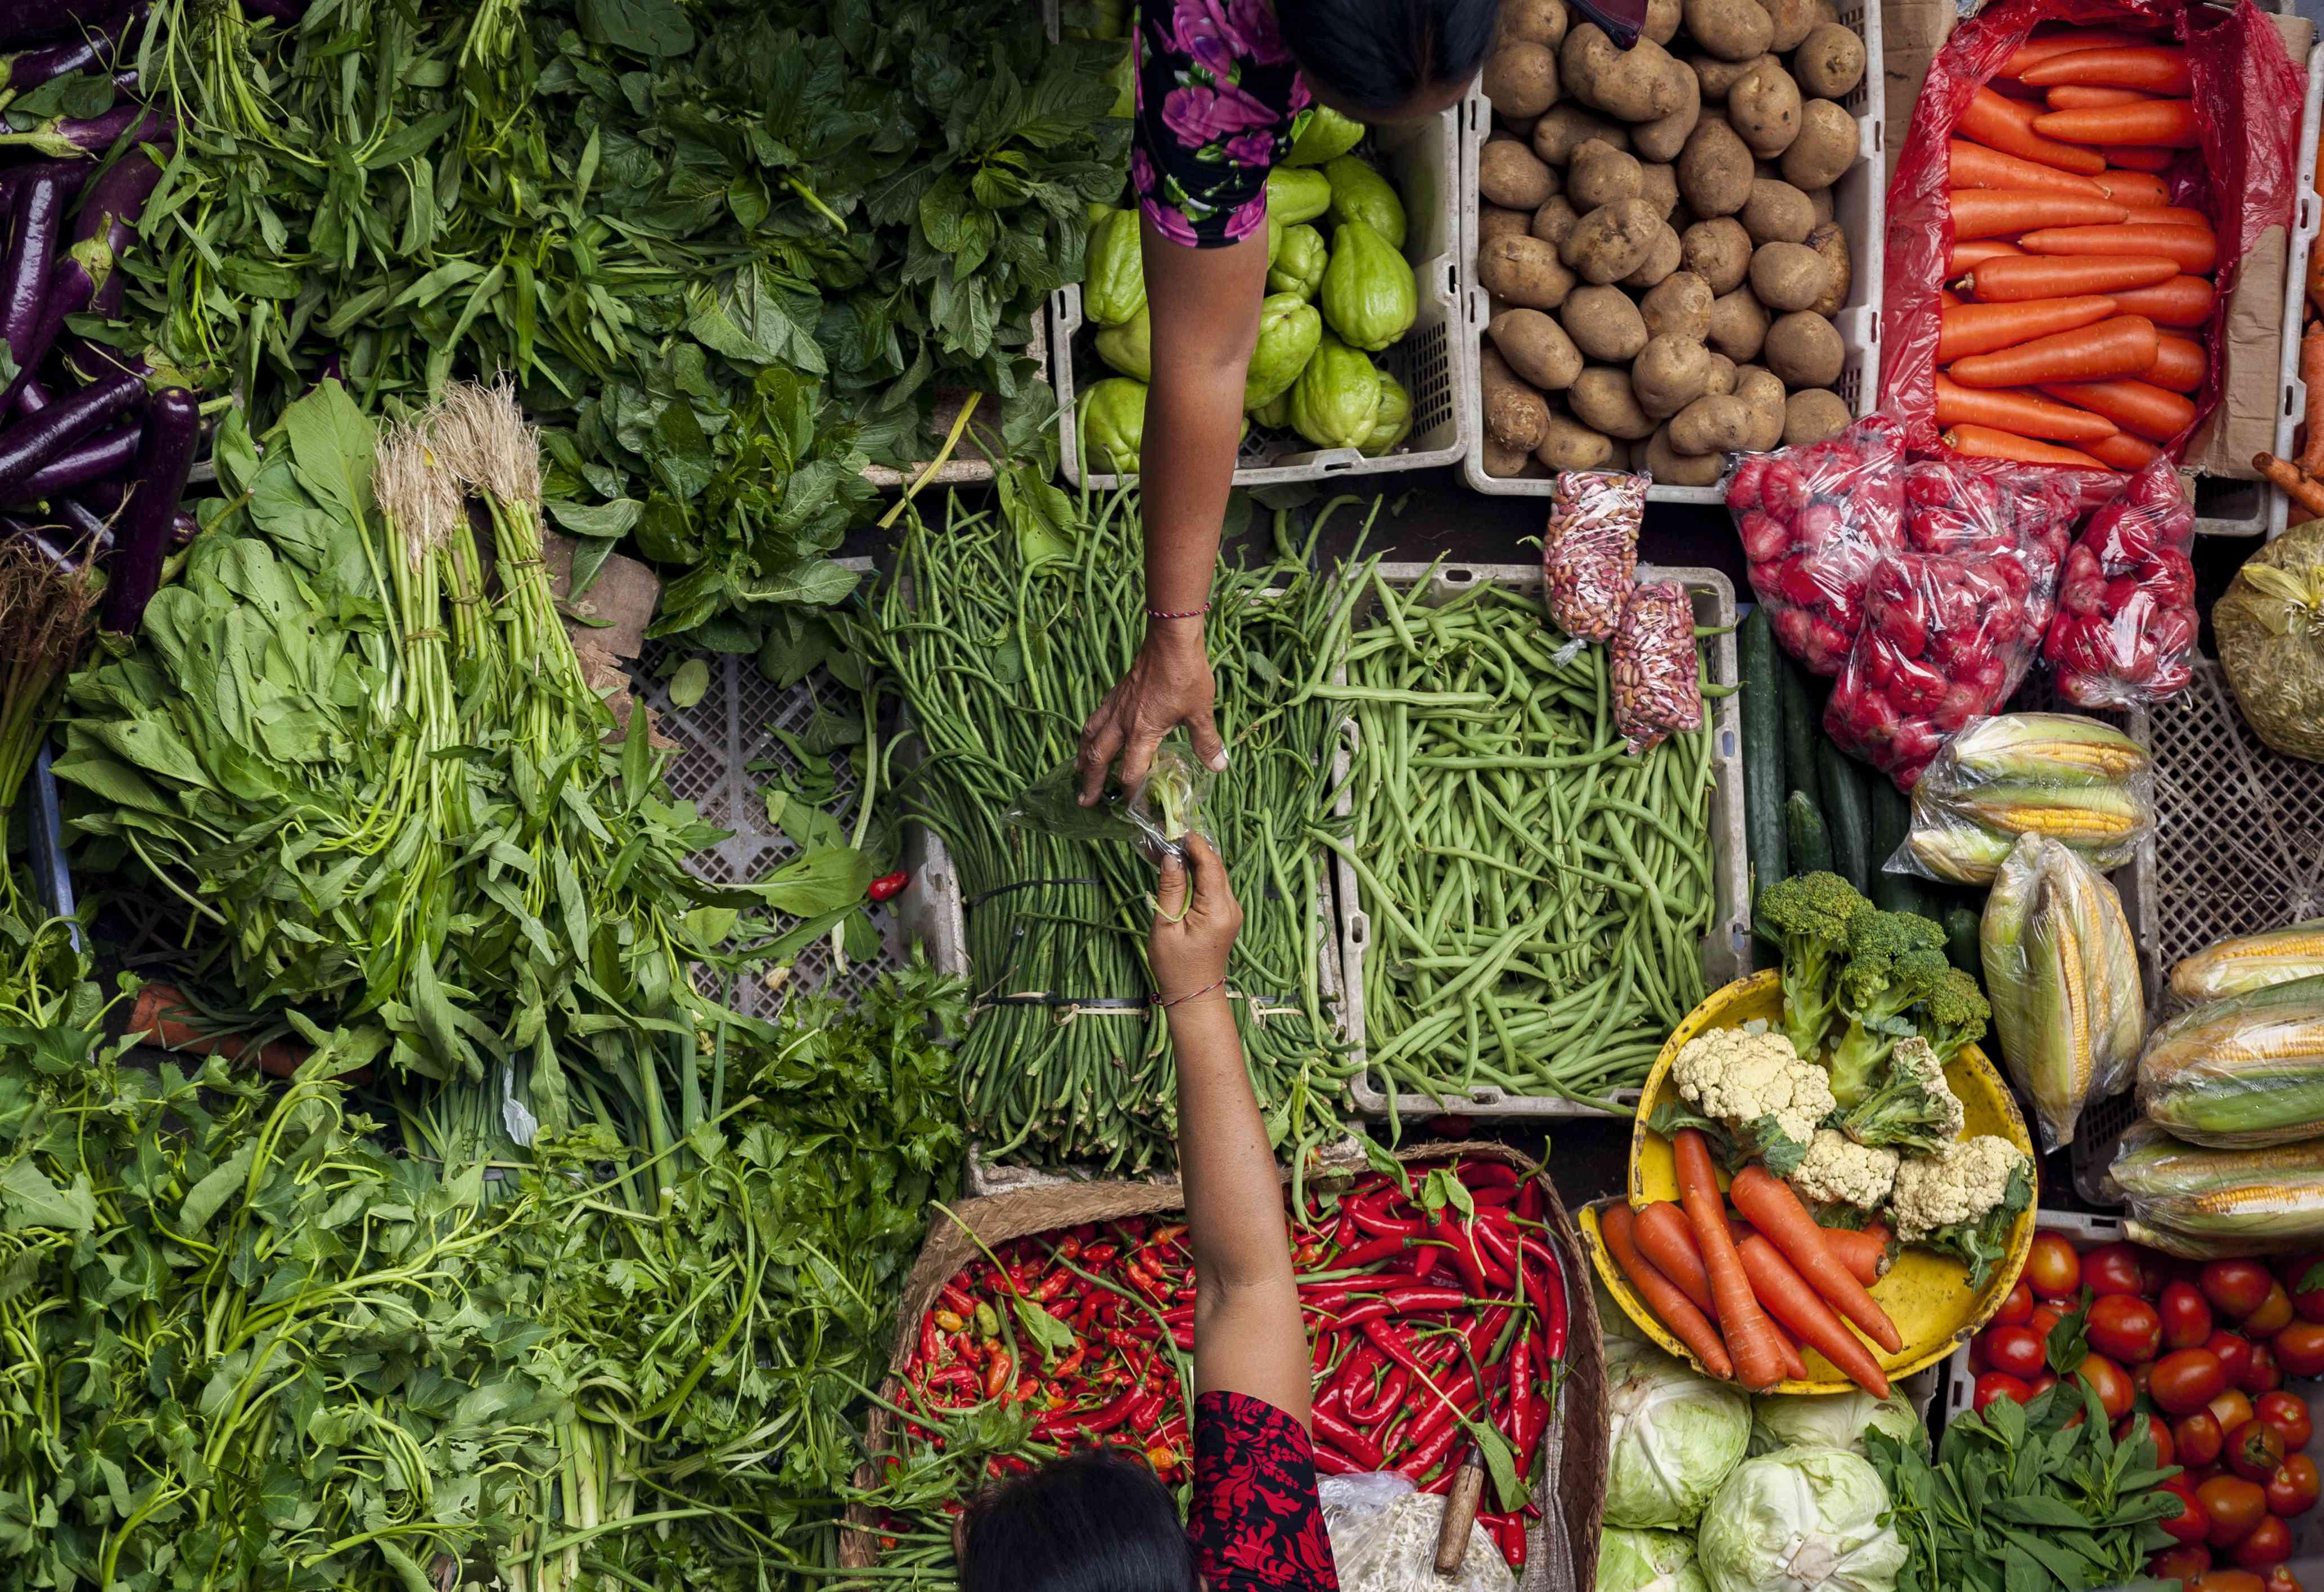 Vegetables at a market in Ubud, Bali